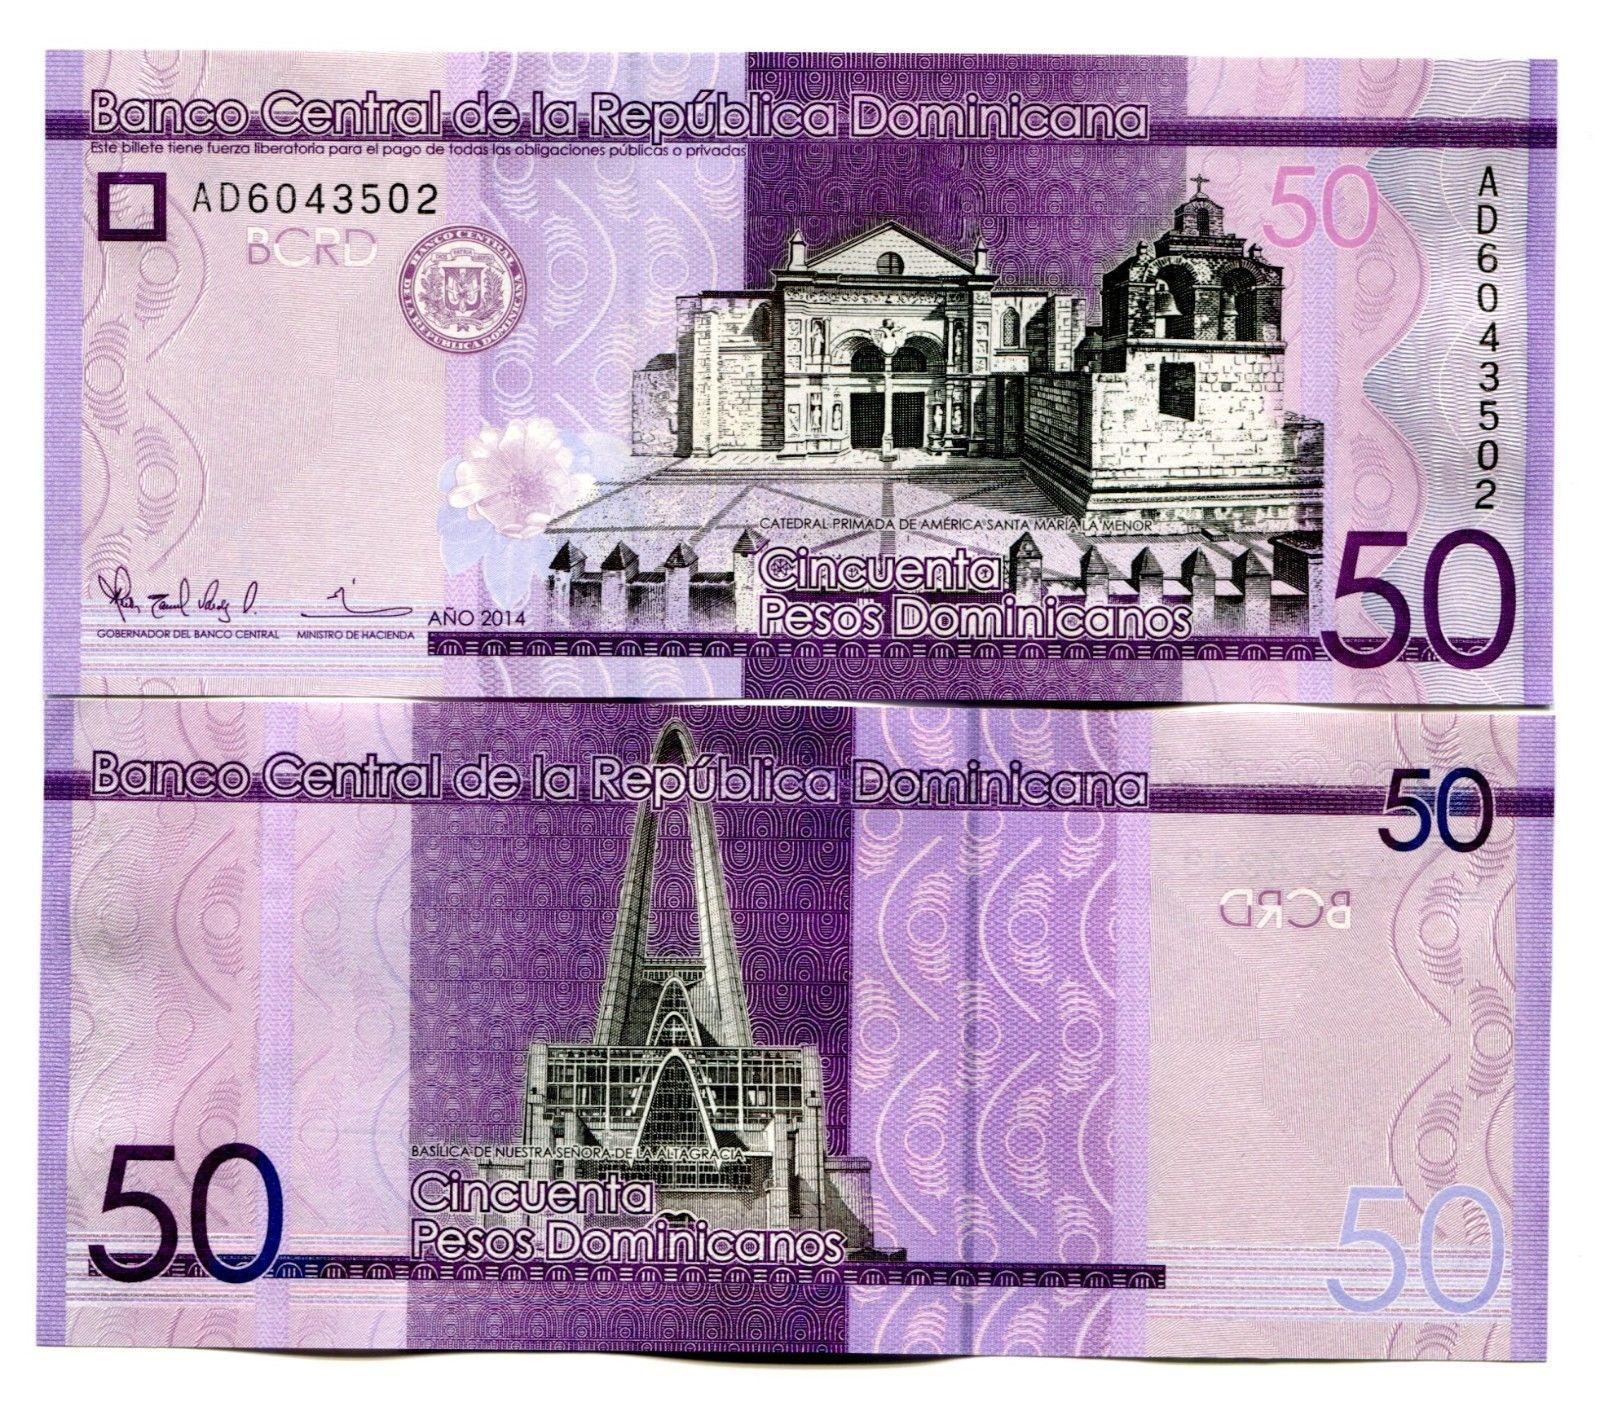 Dominican Republic 50 Pesos Dominicanos P New Unc